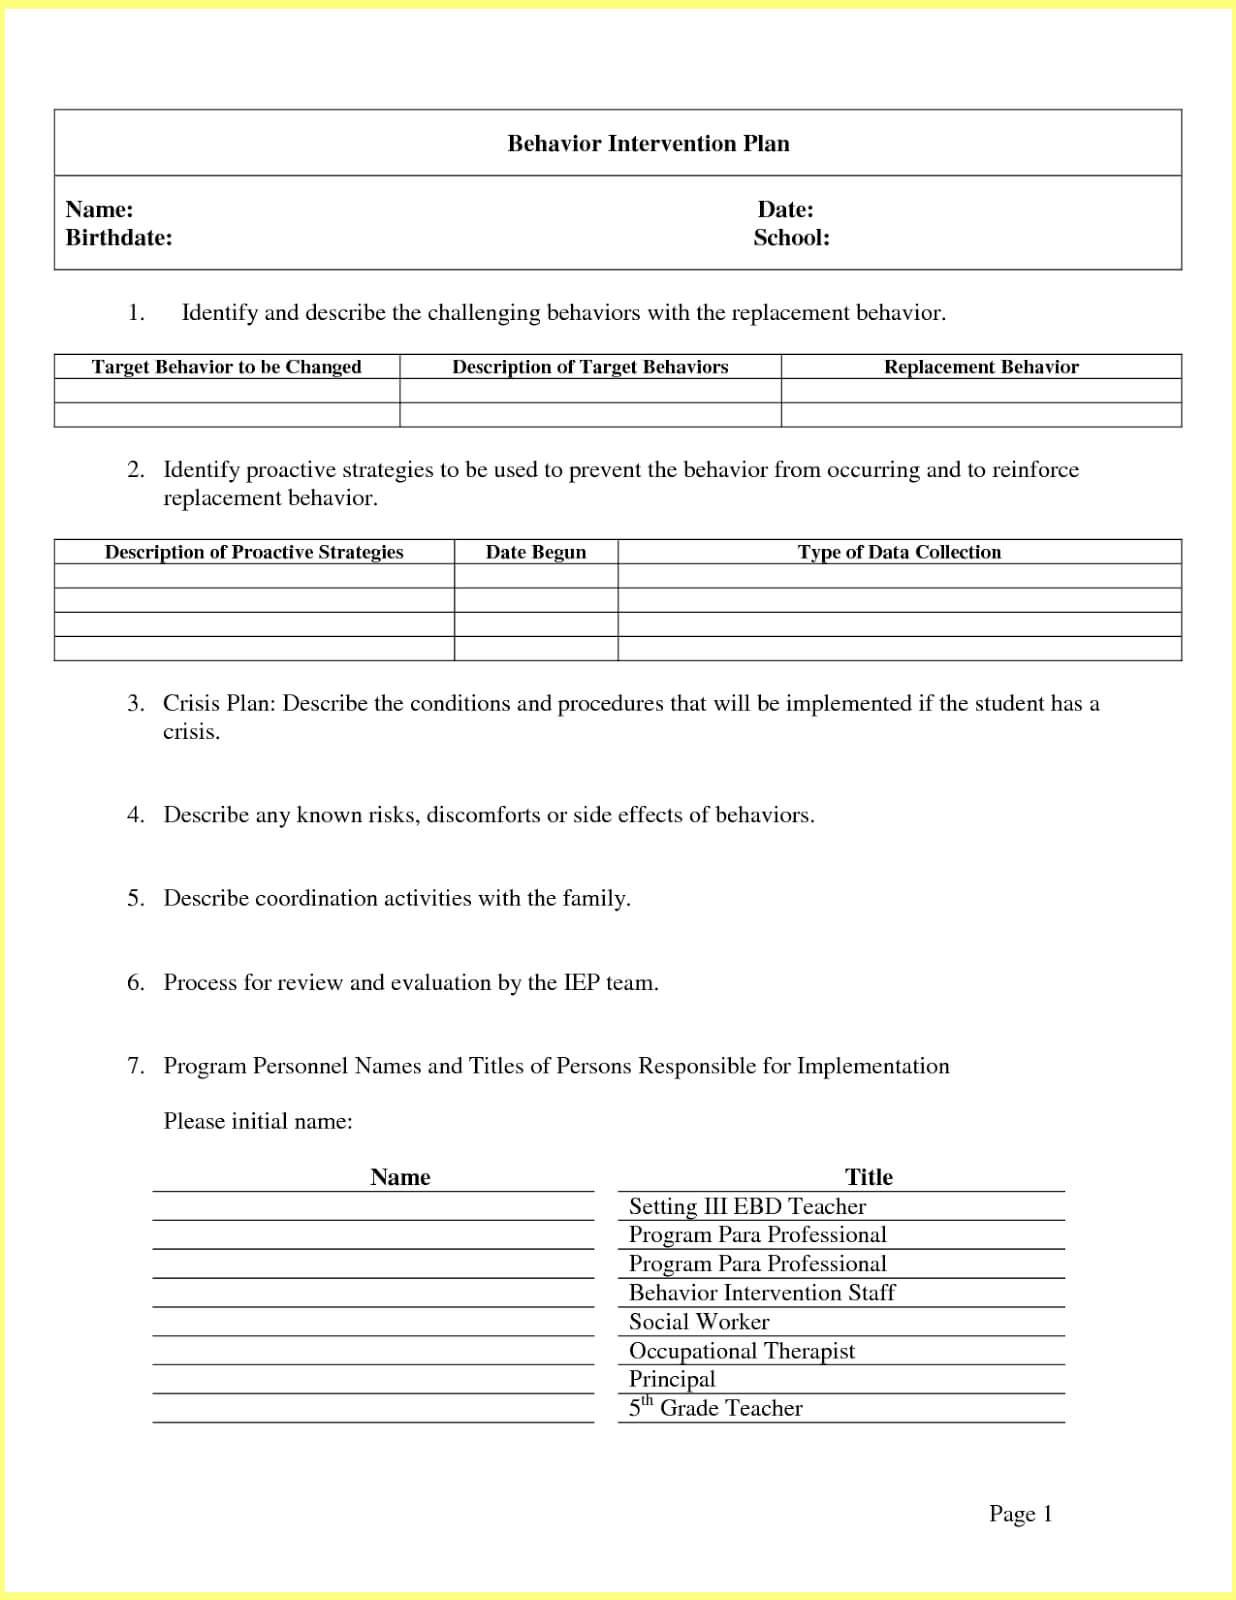 Intervention Report Template ] - Behavior Intervention Plan Regarding Intervention Report Template